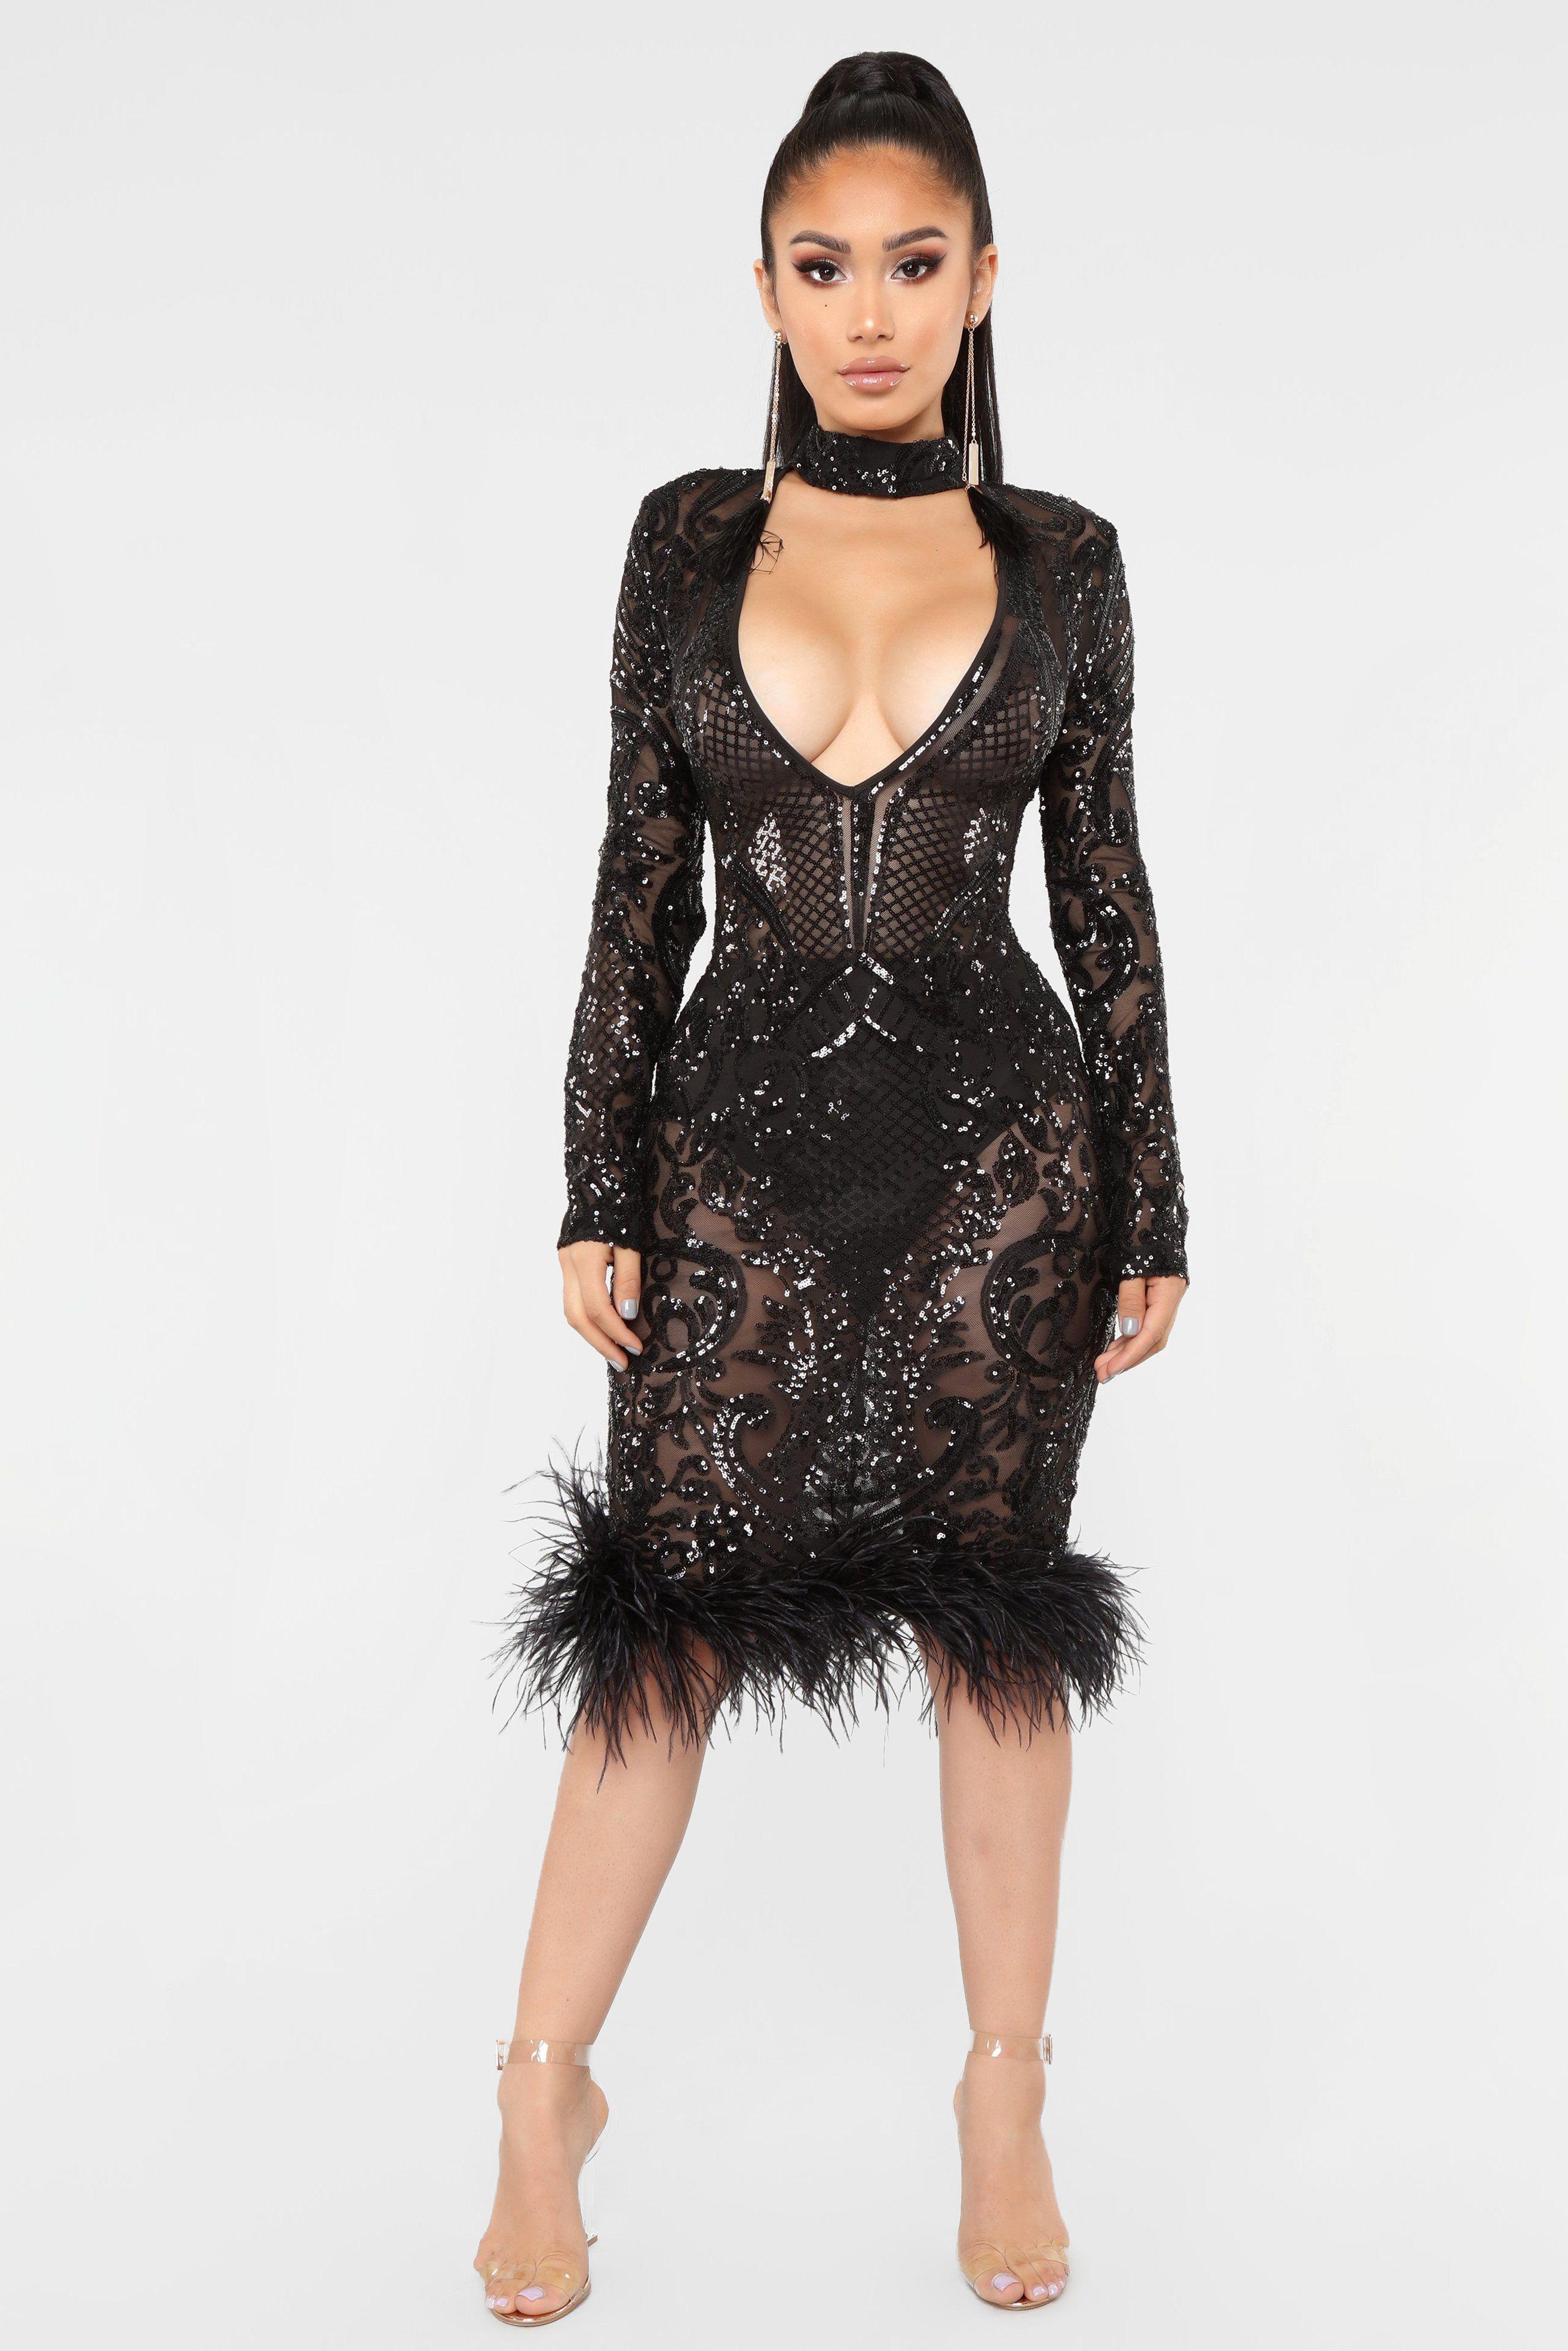 Tonight's The Night Dress Black Night dress, Fashion